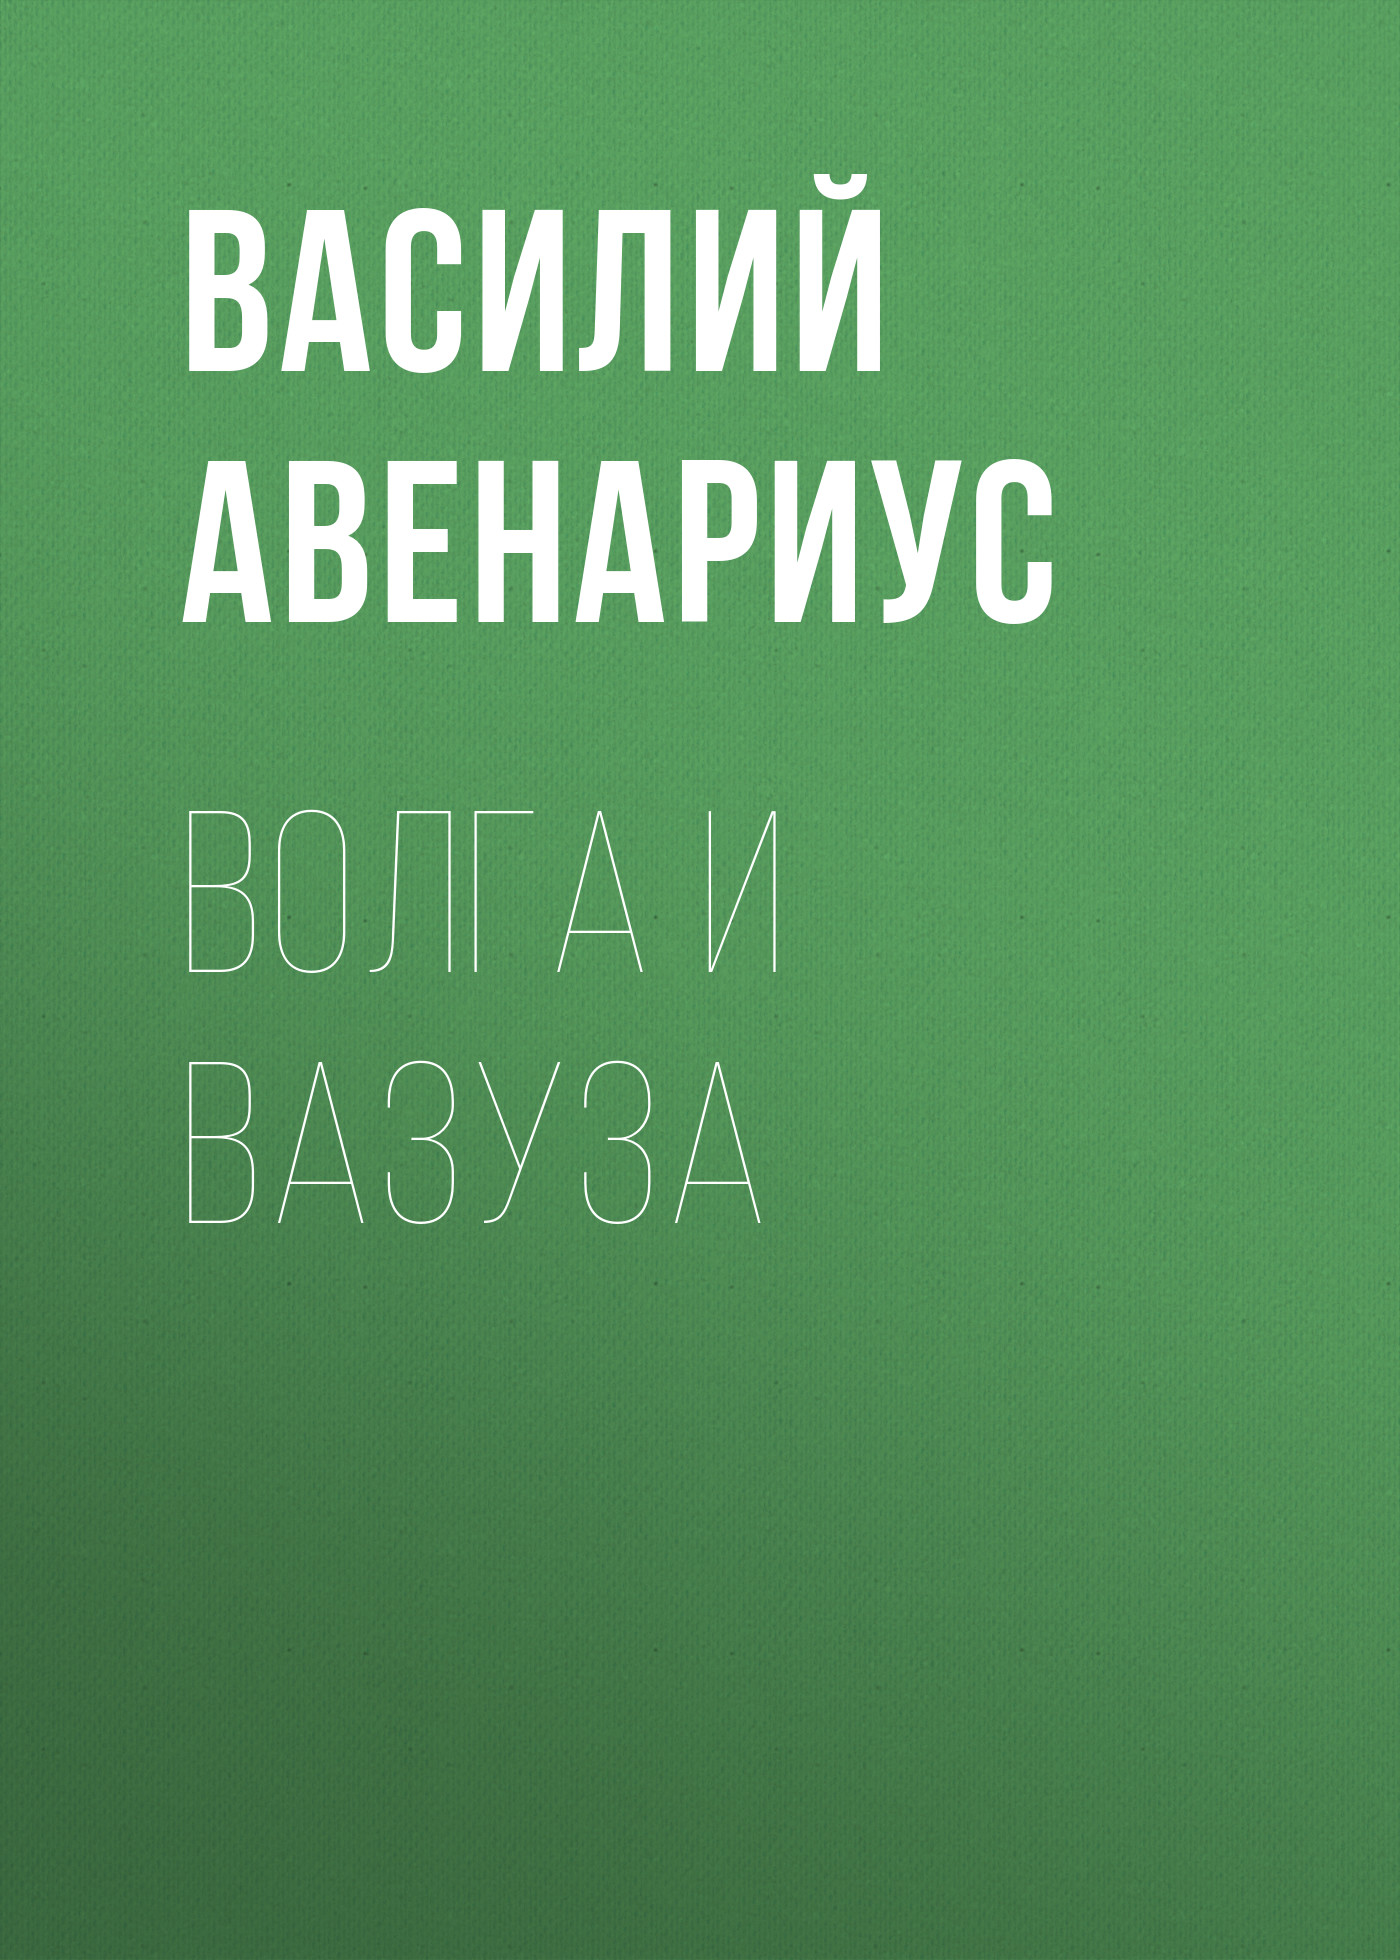 Василий Авенариус и Вазуза